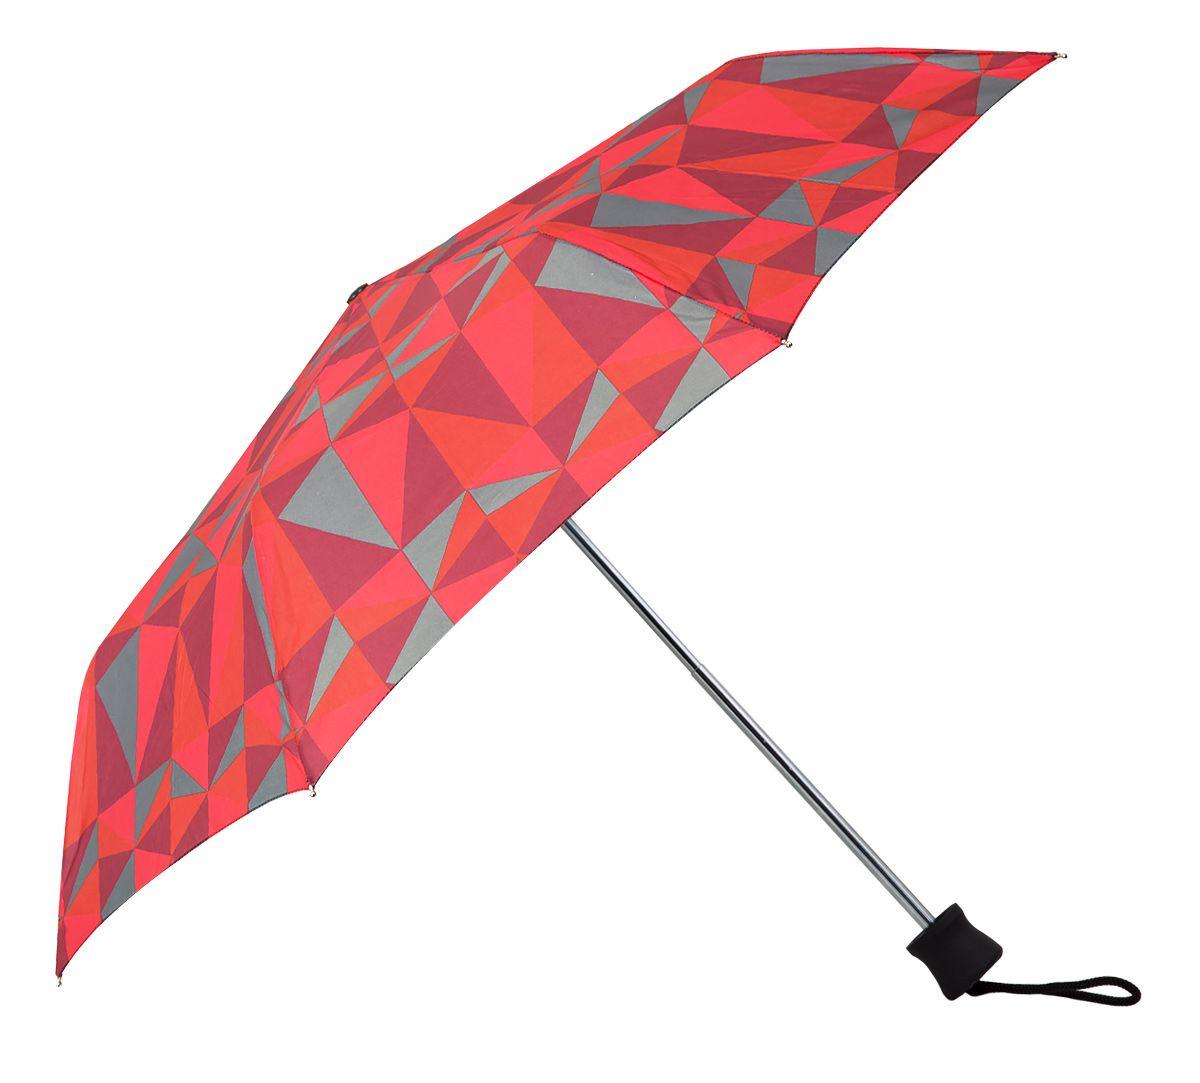 Red Umbrella | Stylish Umbrella